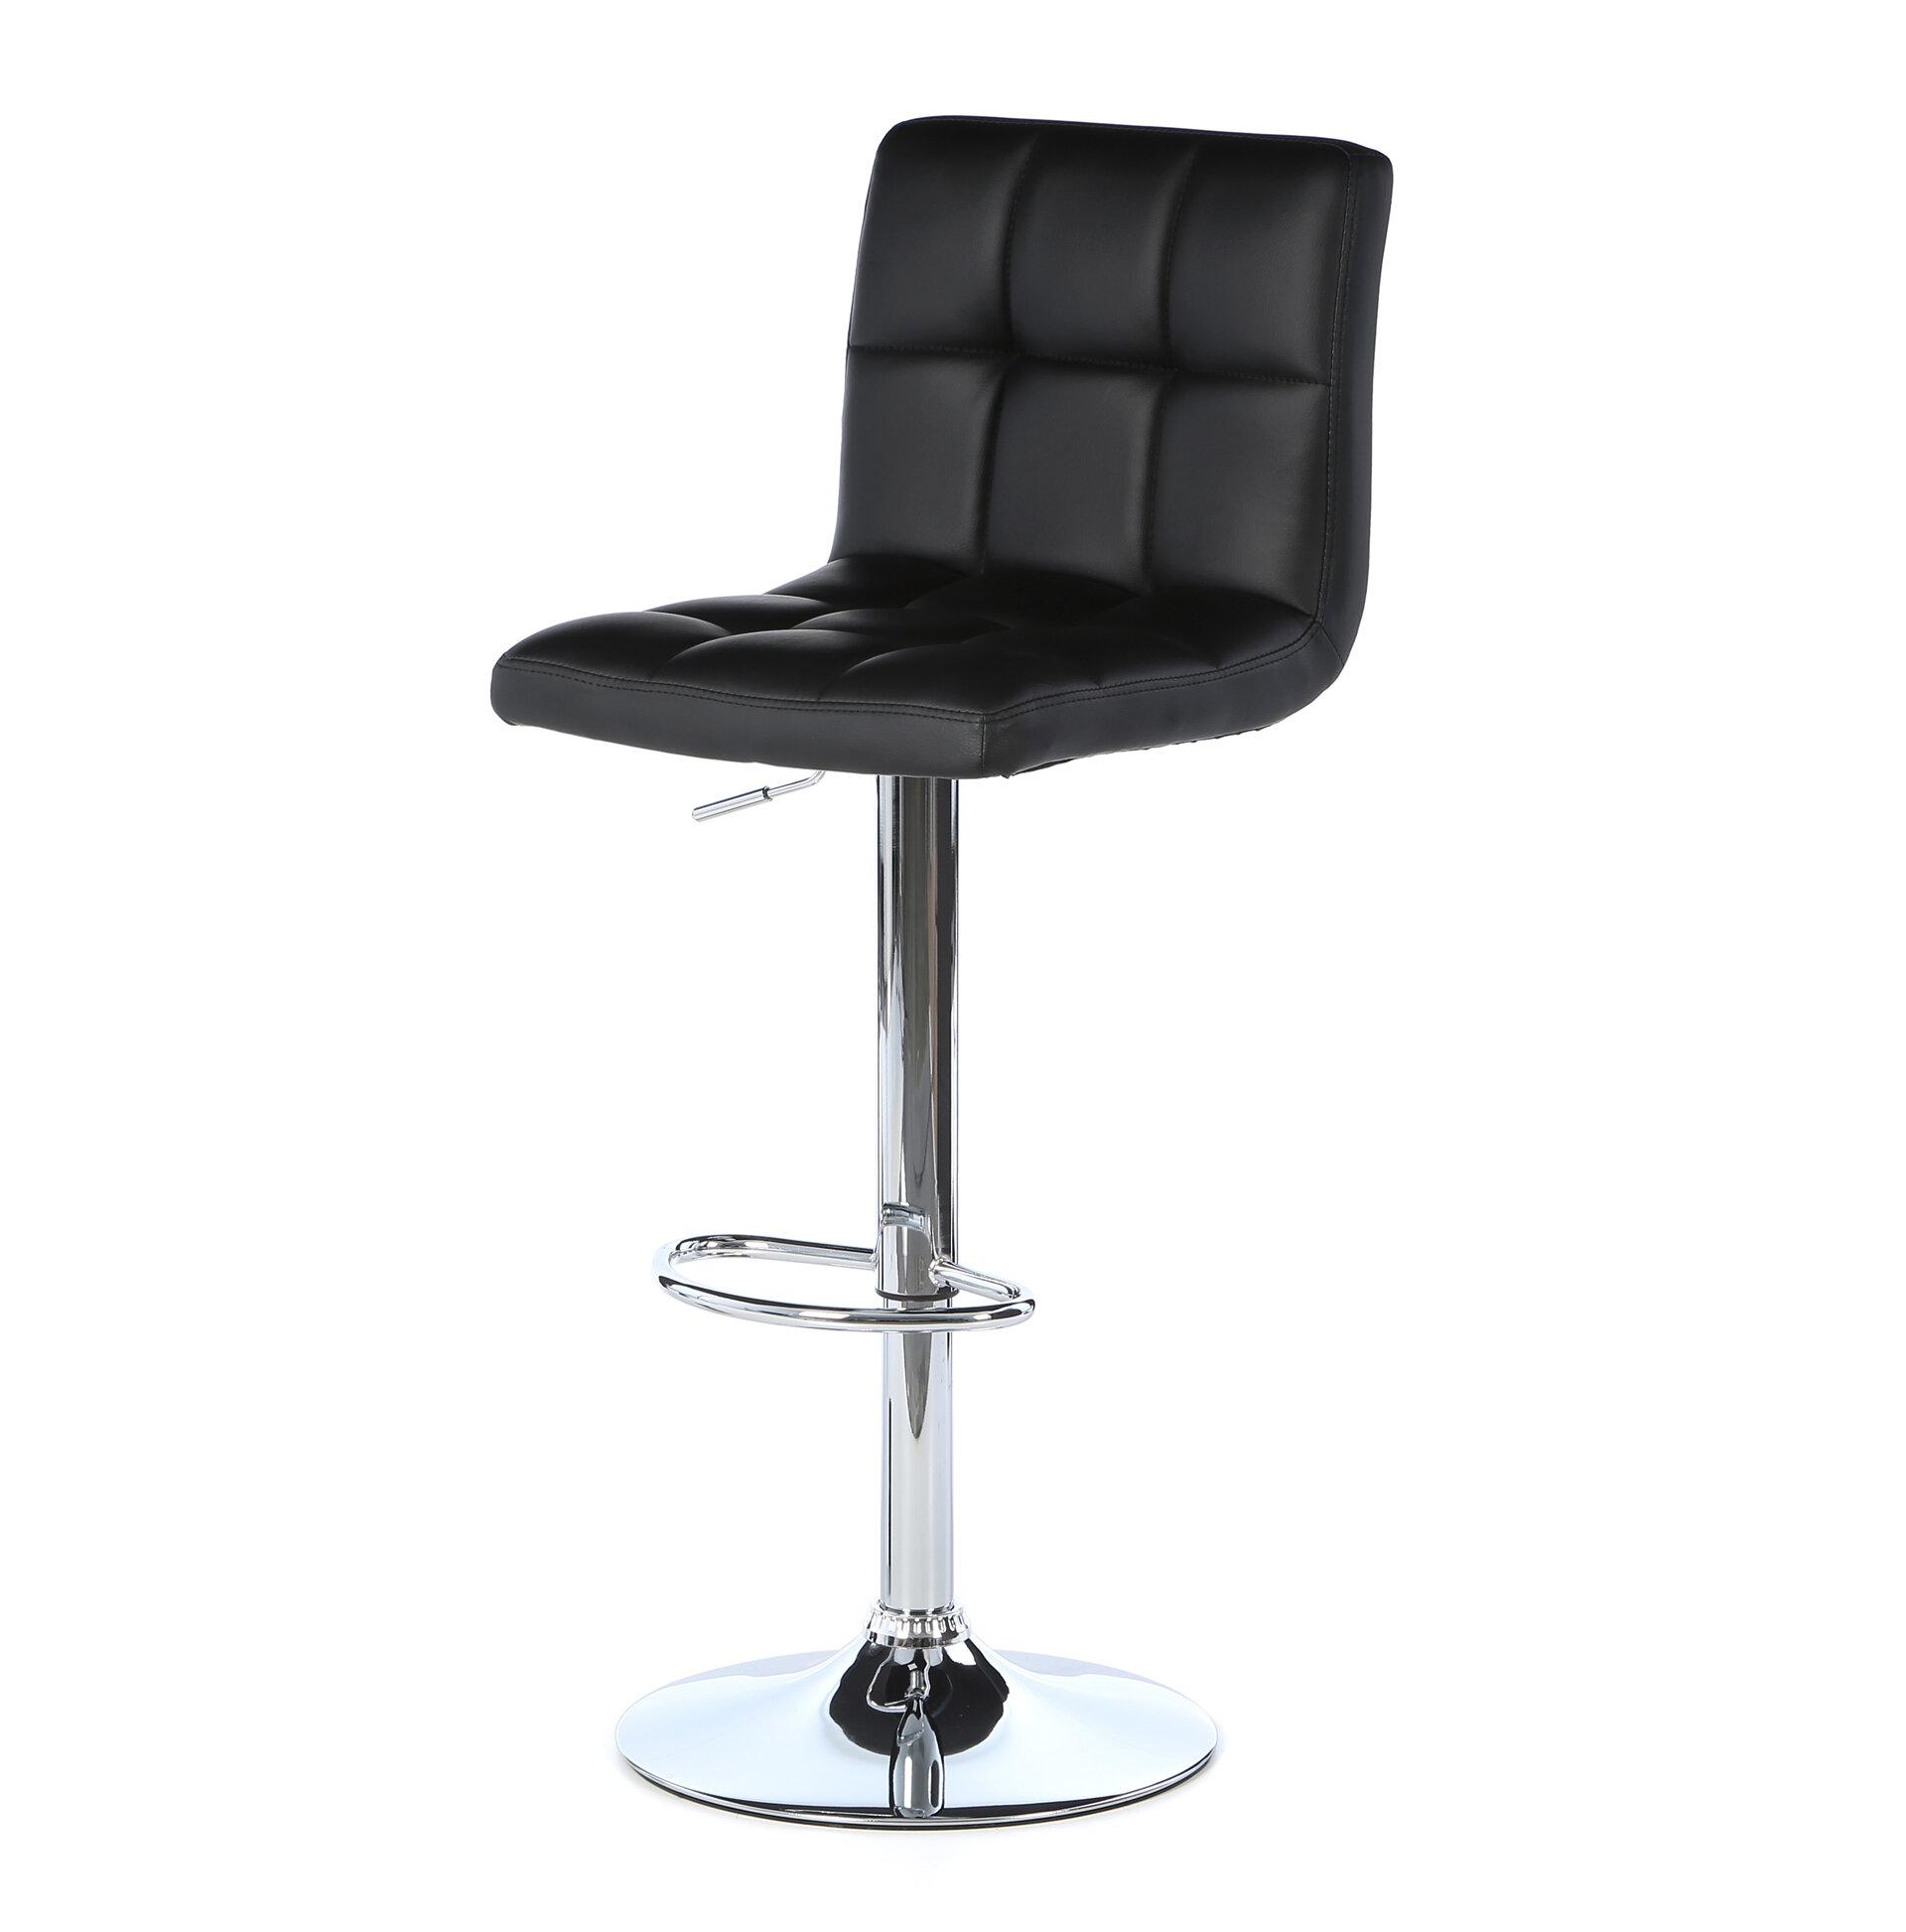 Ordinaire Zipcode Design Full Back Adjustable Height Swivel Bar Stool U0026 Reviews |  Wayfair